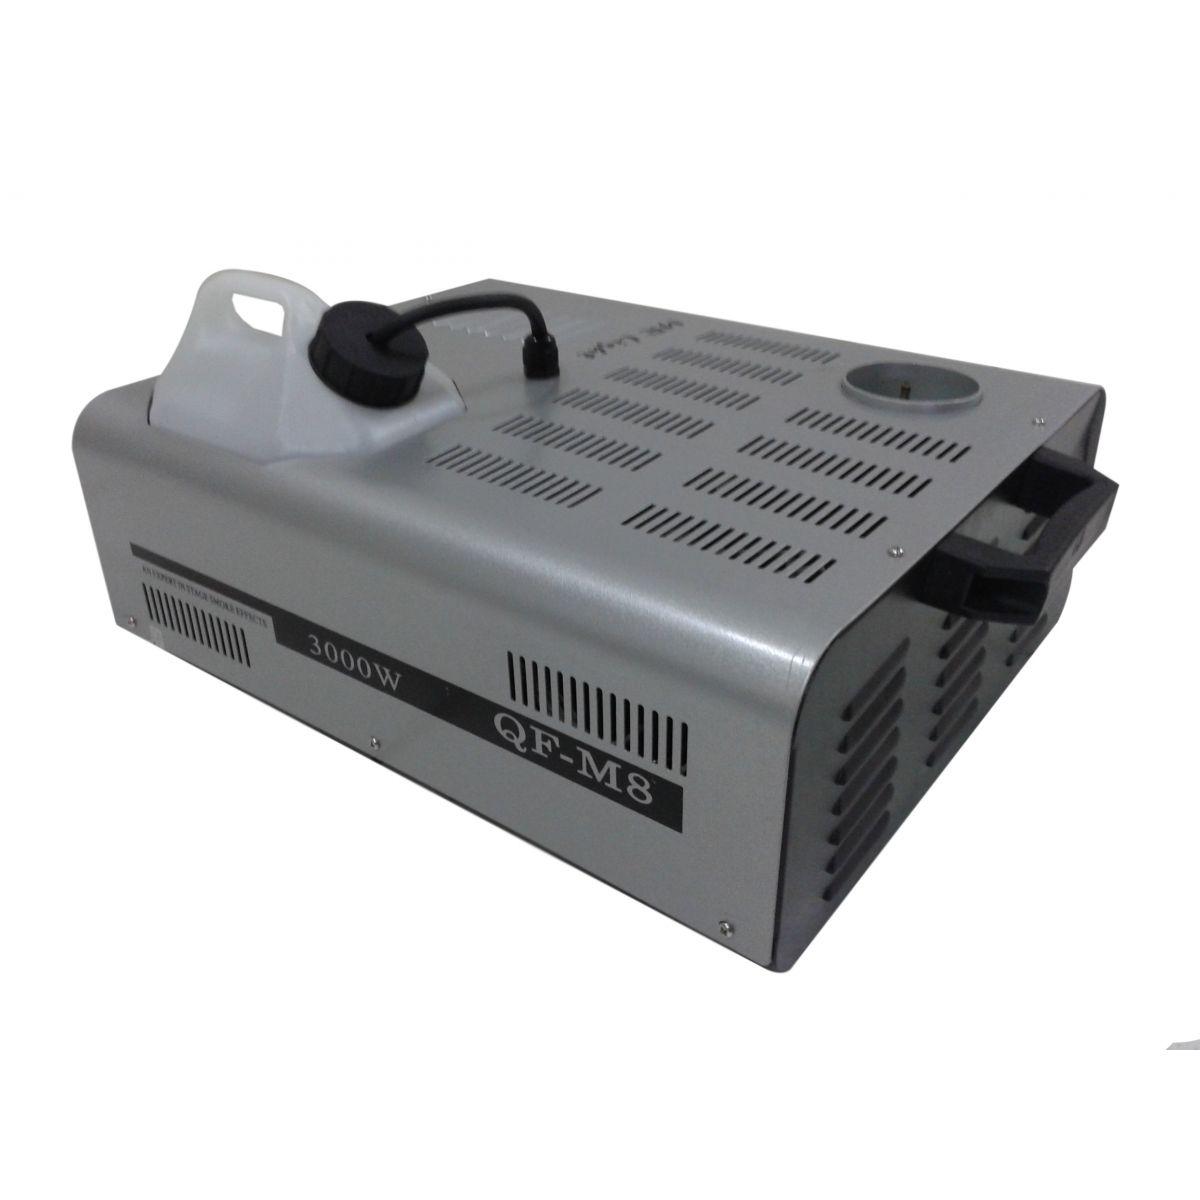 Maquina de Fumaça 3000W - QF-M8 - Jato Vertical - Controle Remoto, Manual e DMX